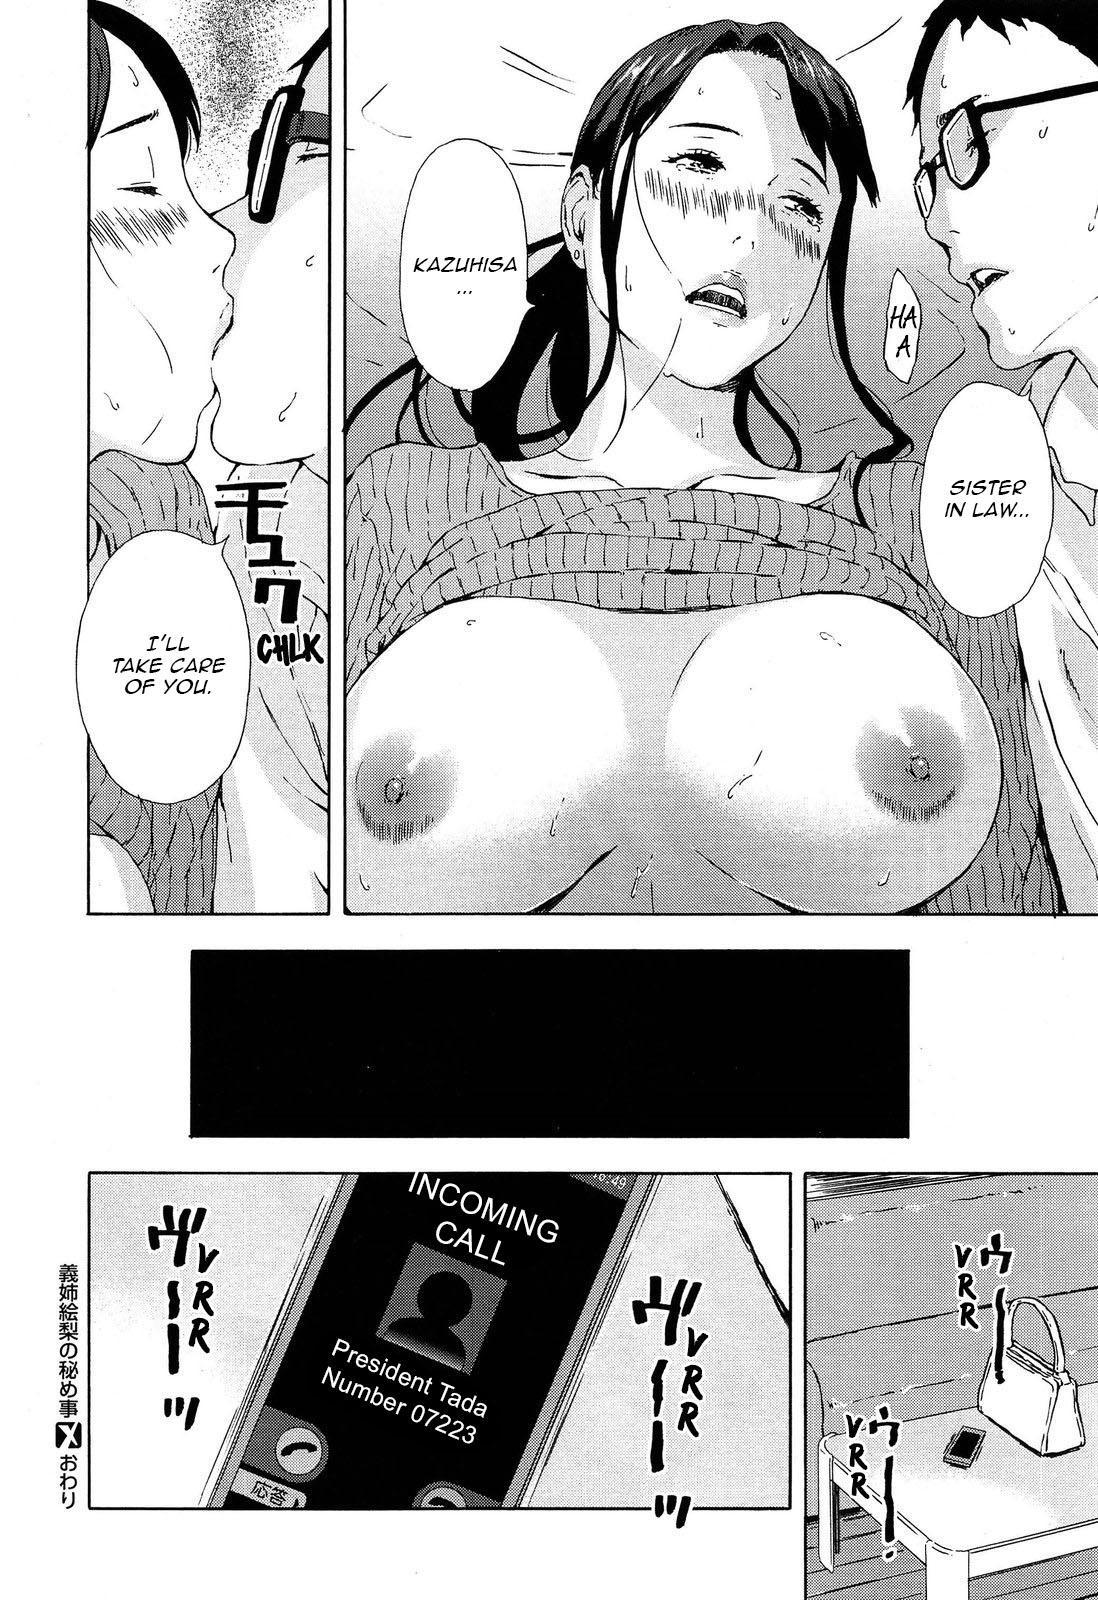 Gishi Eri no himegoto | The Secret of Eri, my Sister in Law 1-2 17